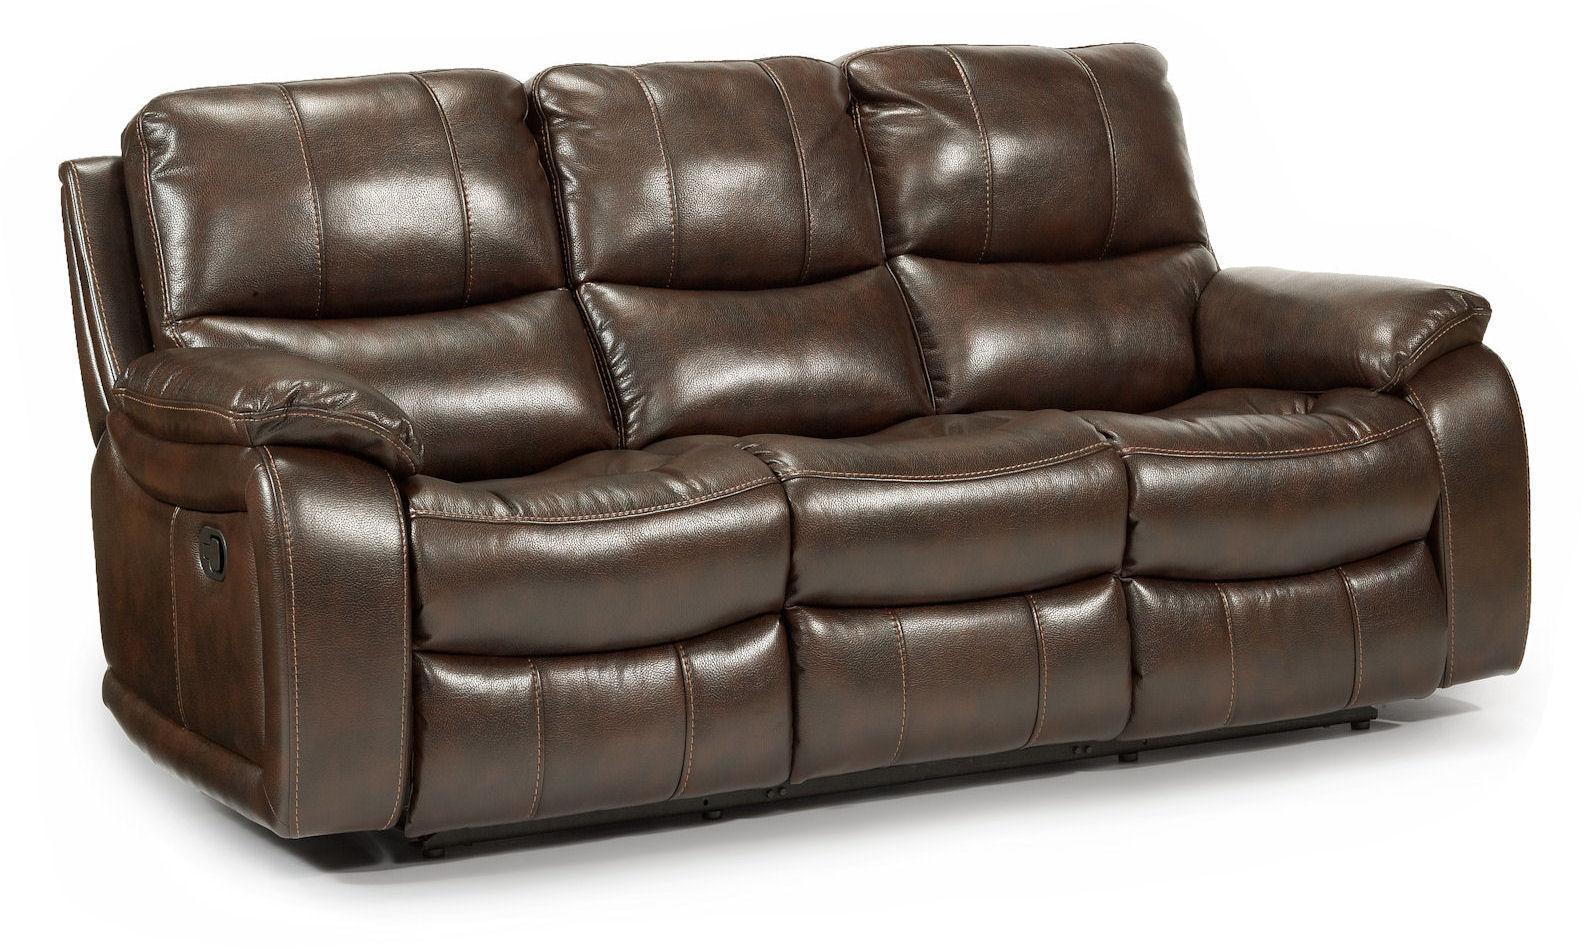 Flexsteel Latitudes   WoodstockDouble Reclining Sofa ...